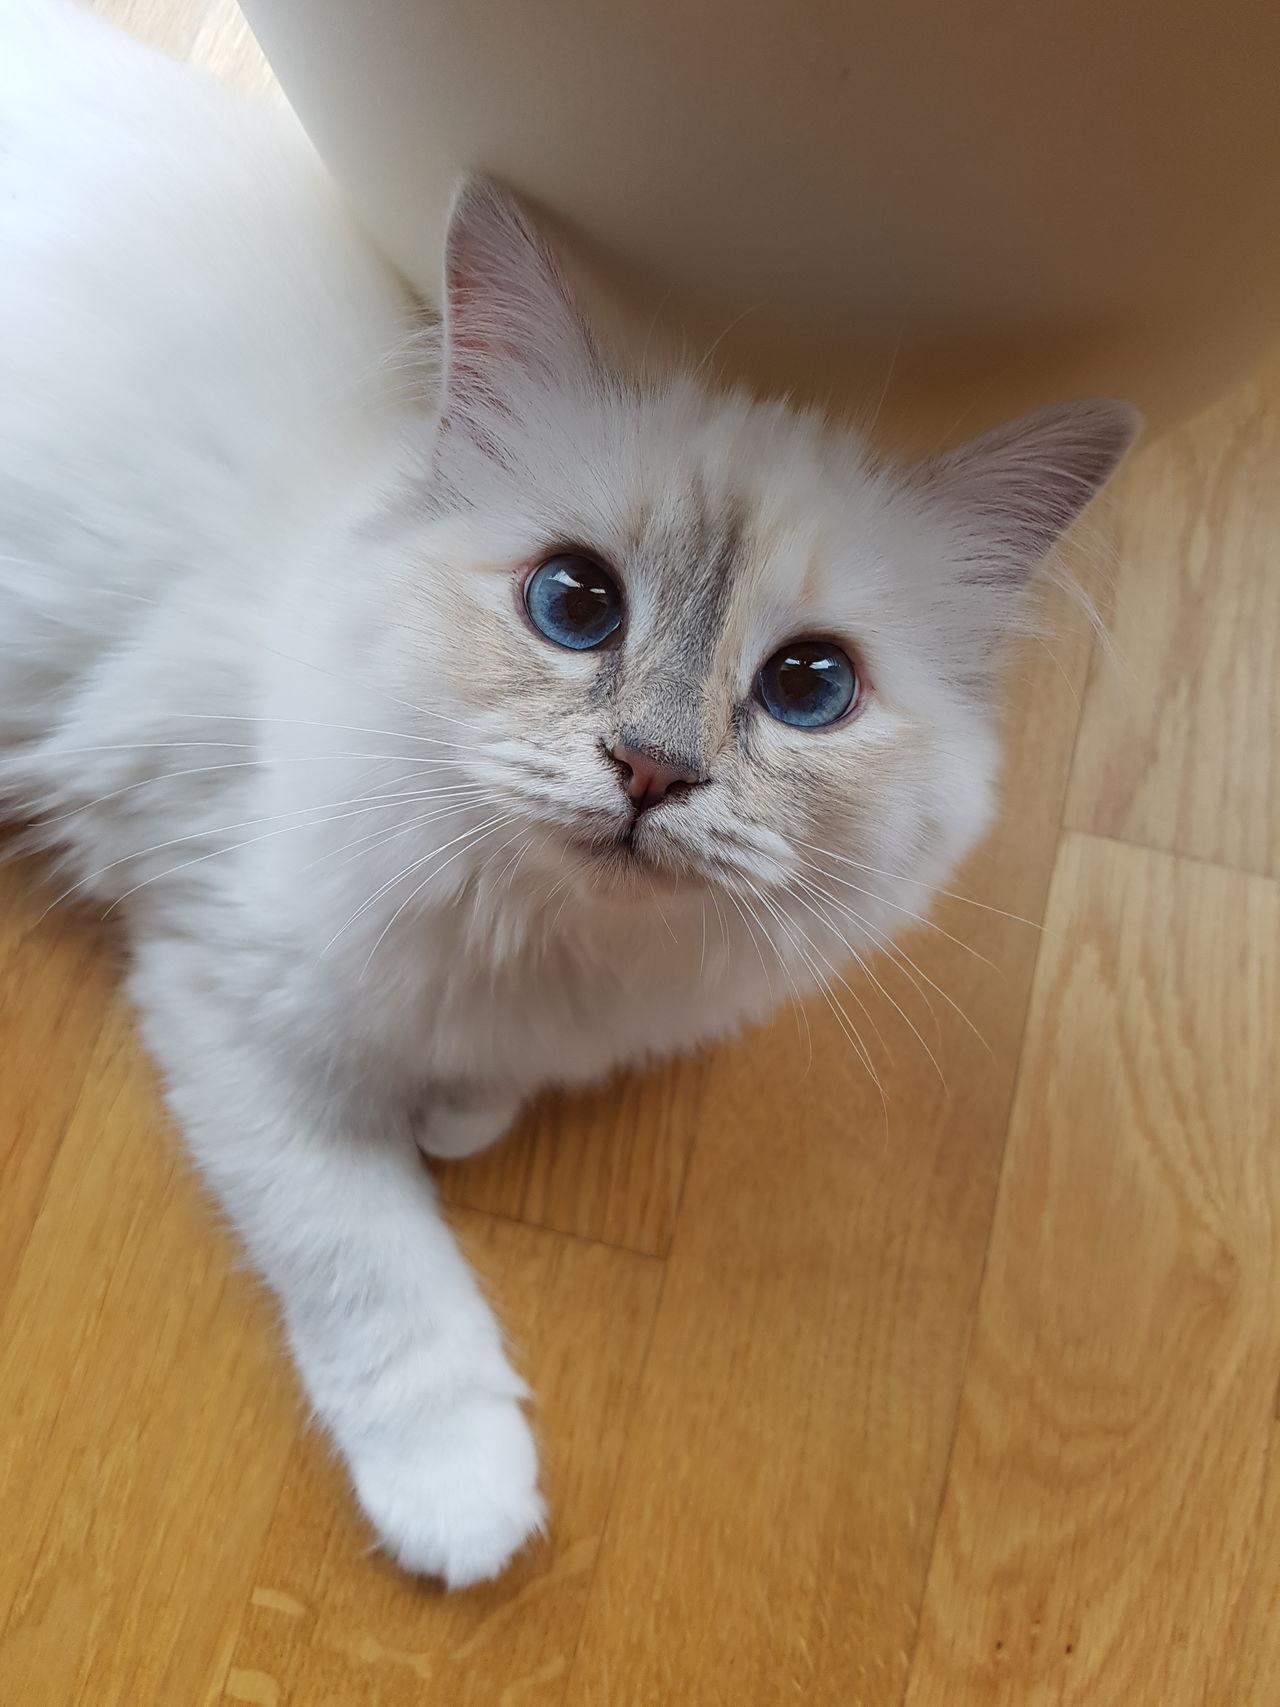 Domestic Cat Pets Katze Birmakatze Cat Blaue Augen Birman  Kitten Looking At Camera Love